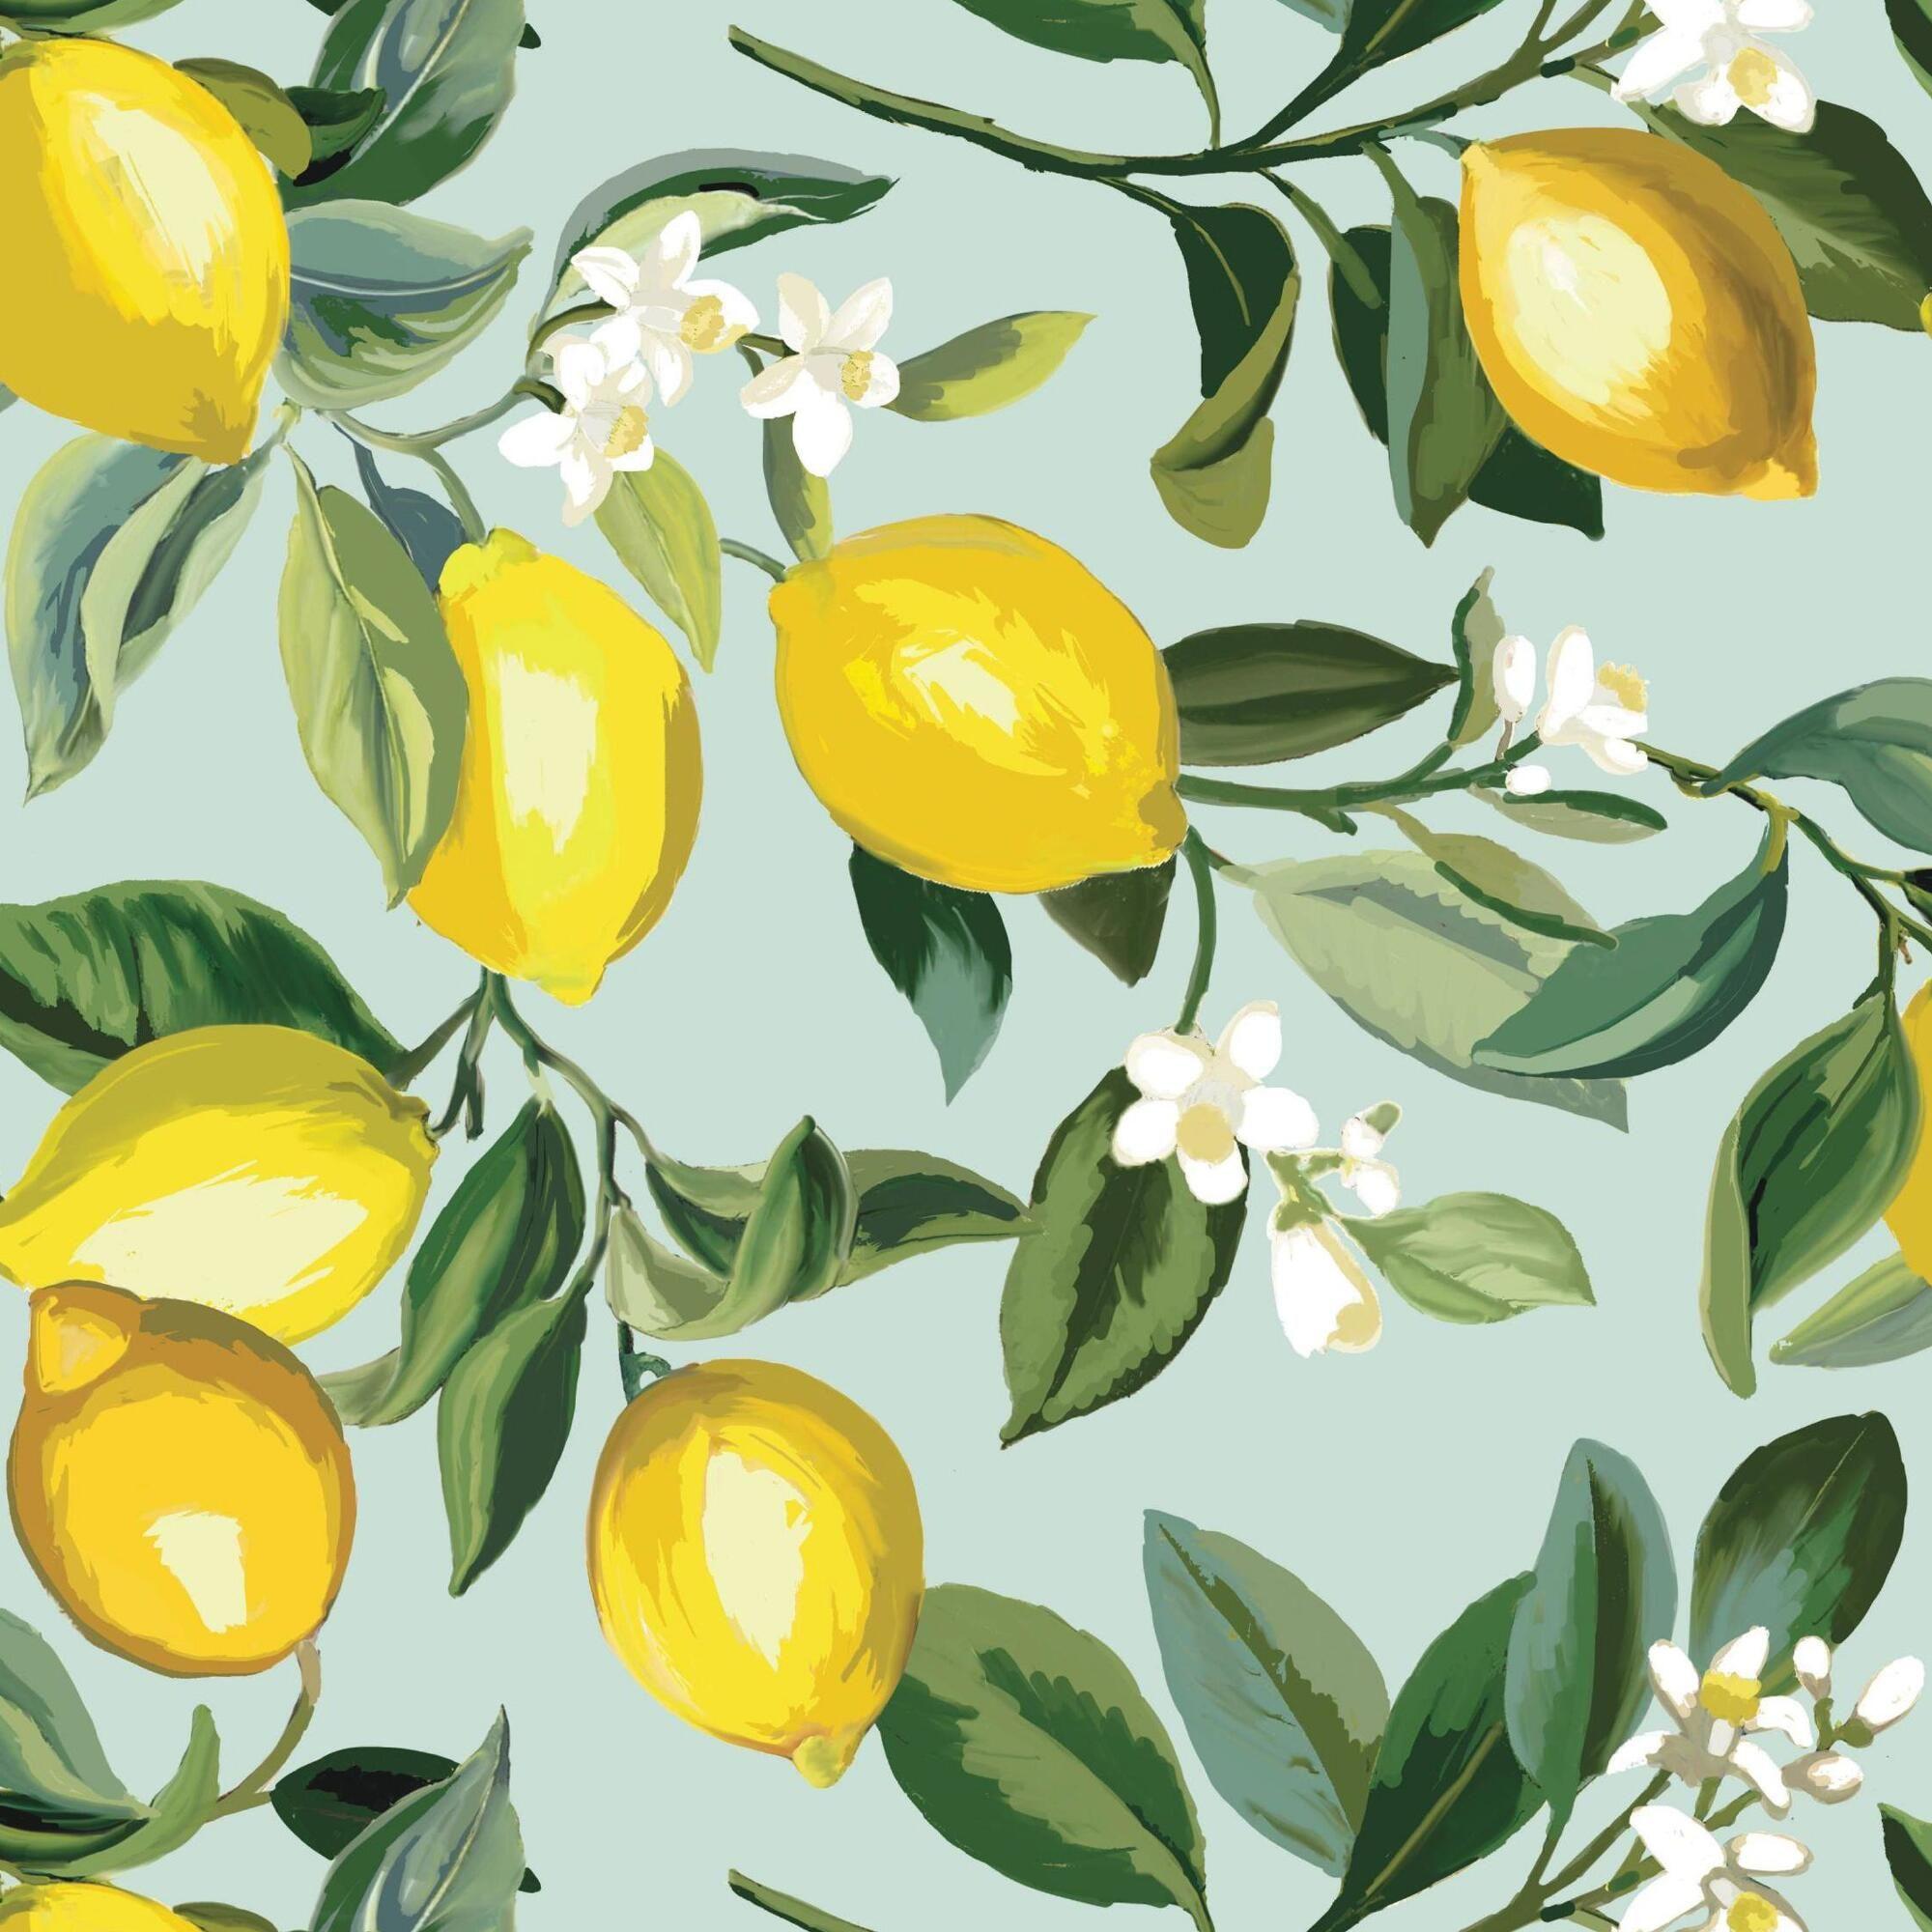 Light Blue And Yellow Lemon Peel And Stick Wallpaper By World Market Papierwande Tapeten Sticken